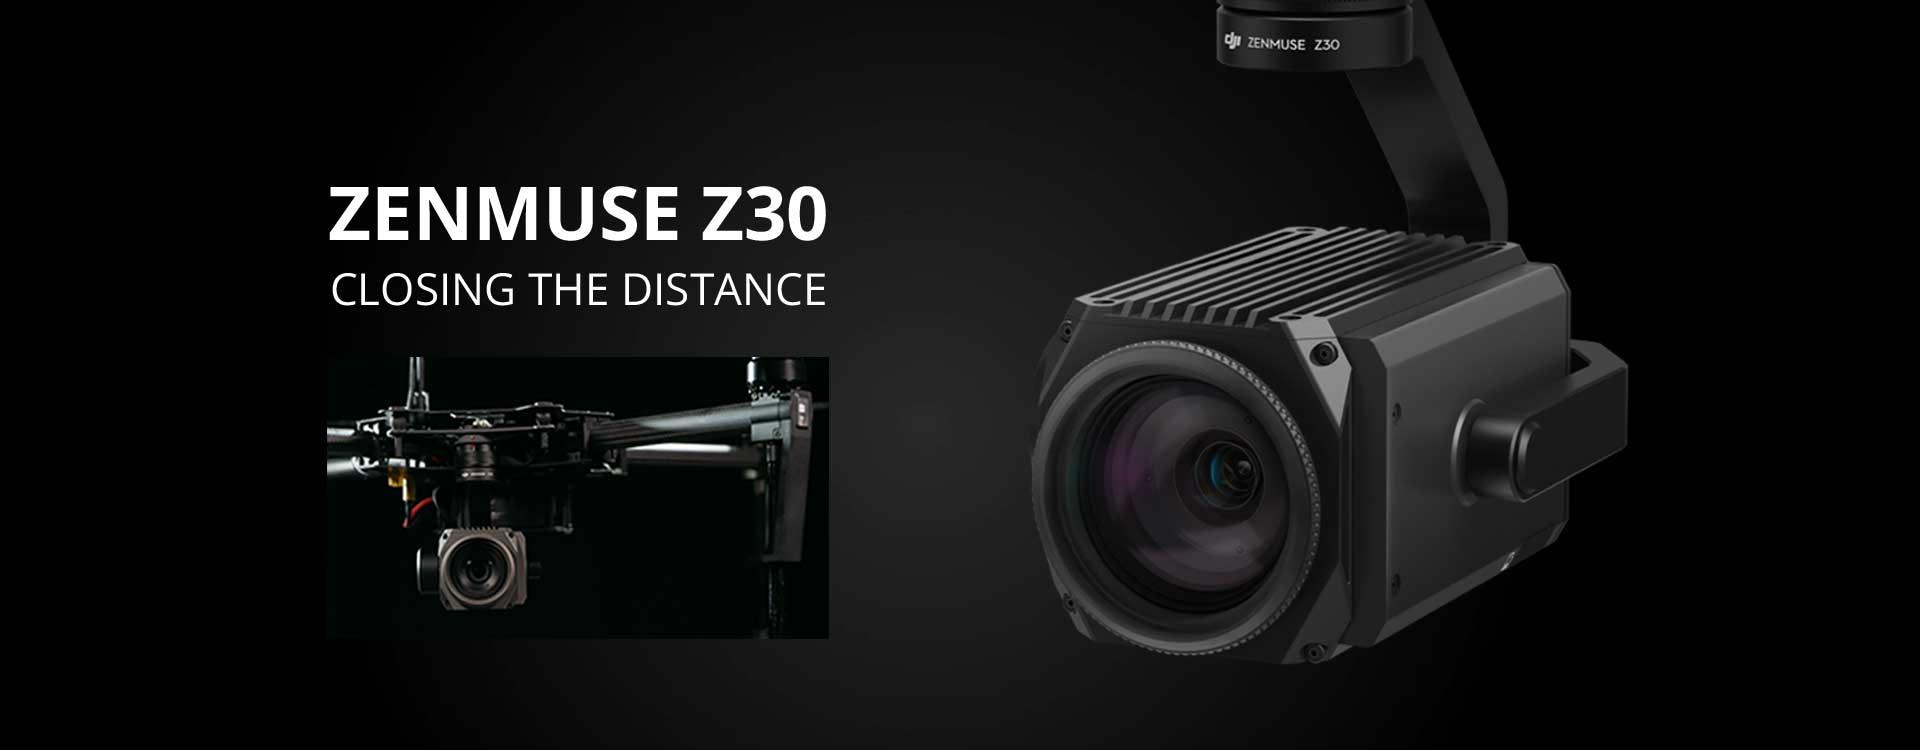 DJI Zenmuse Z30